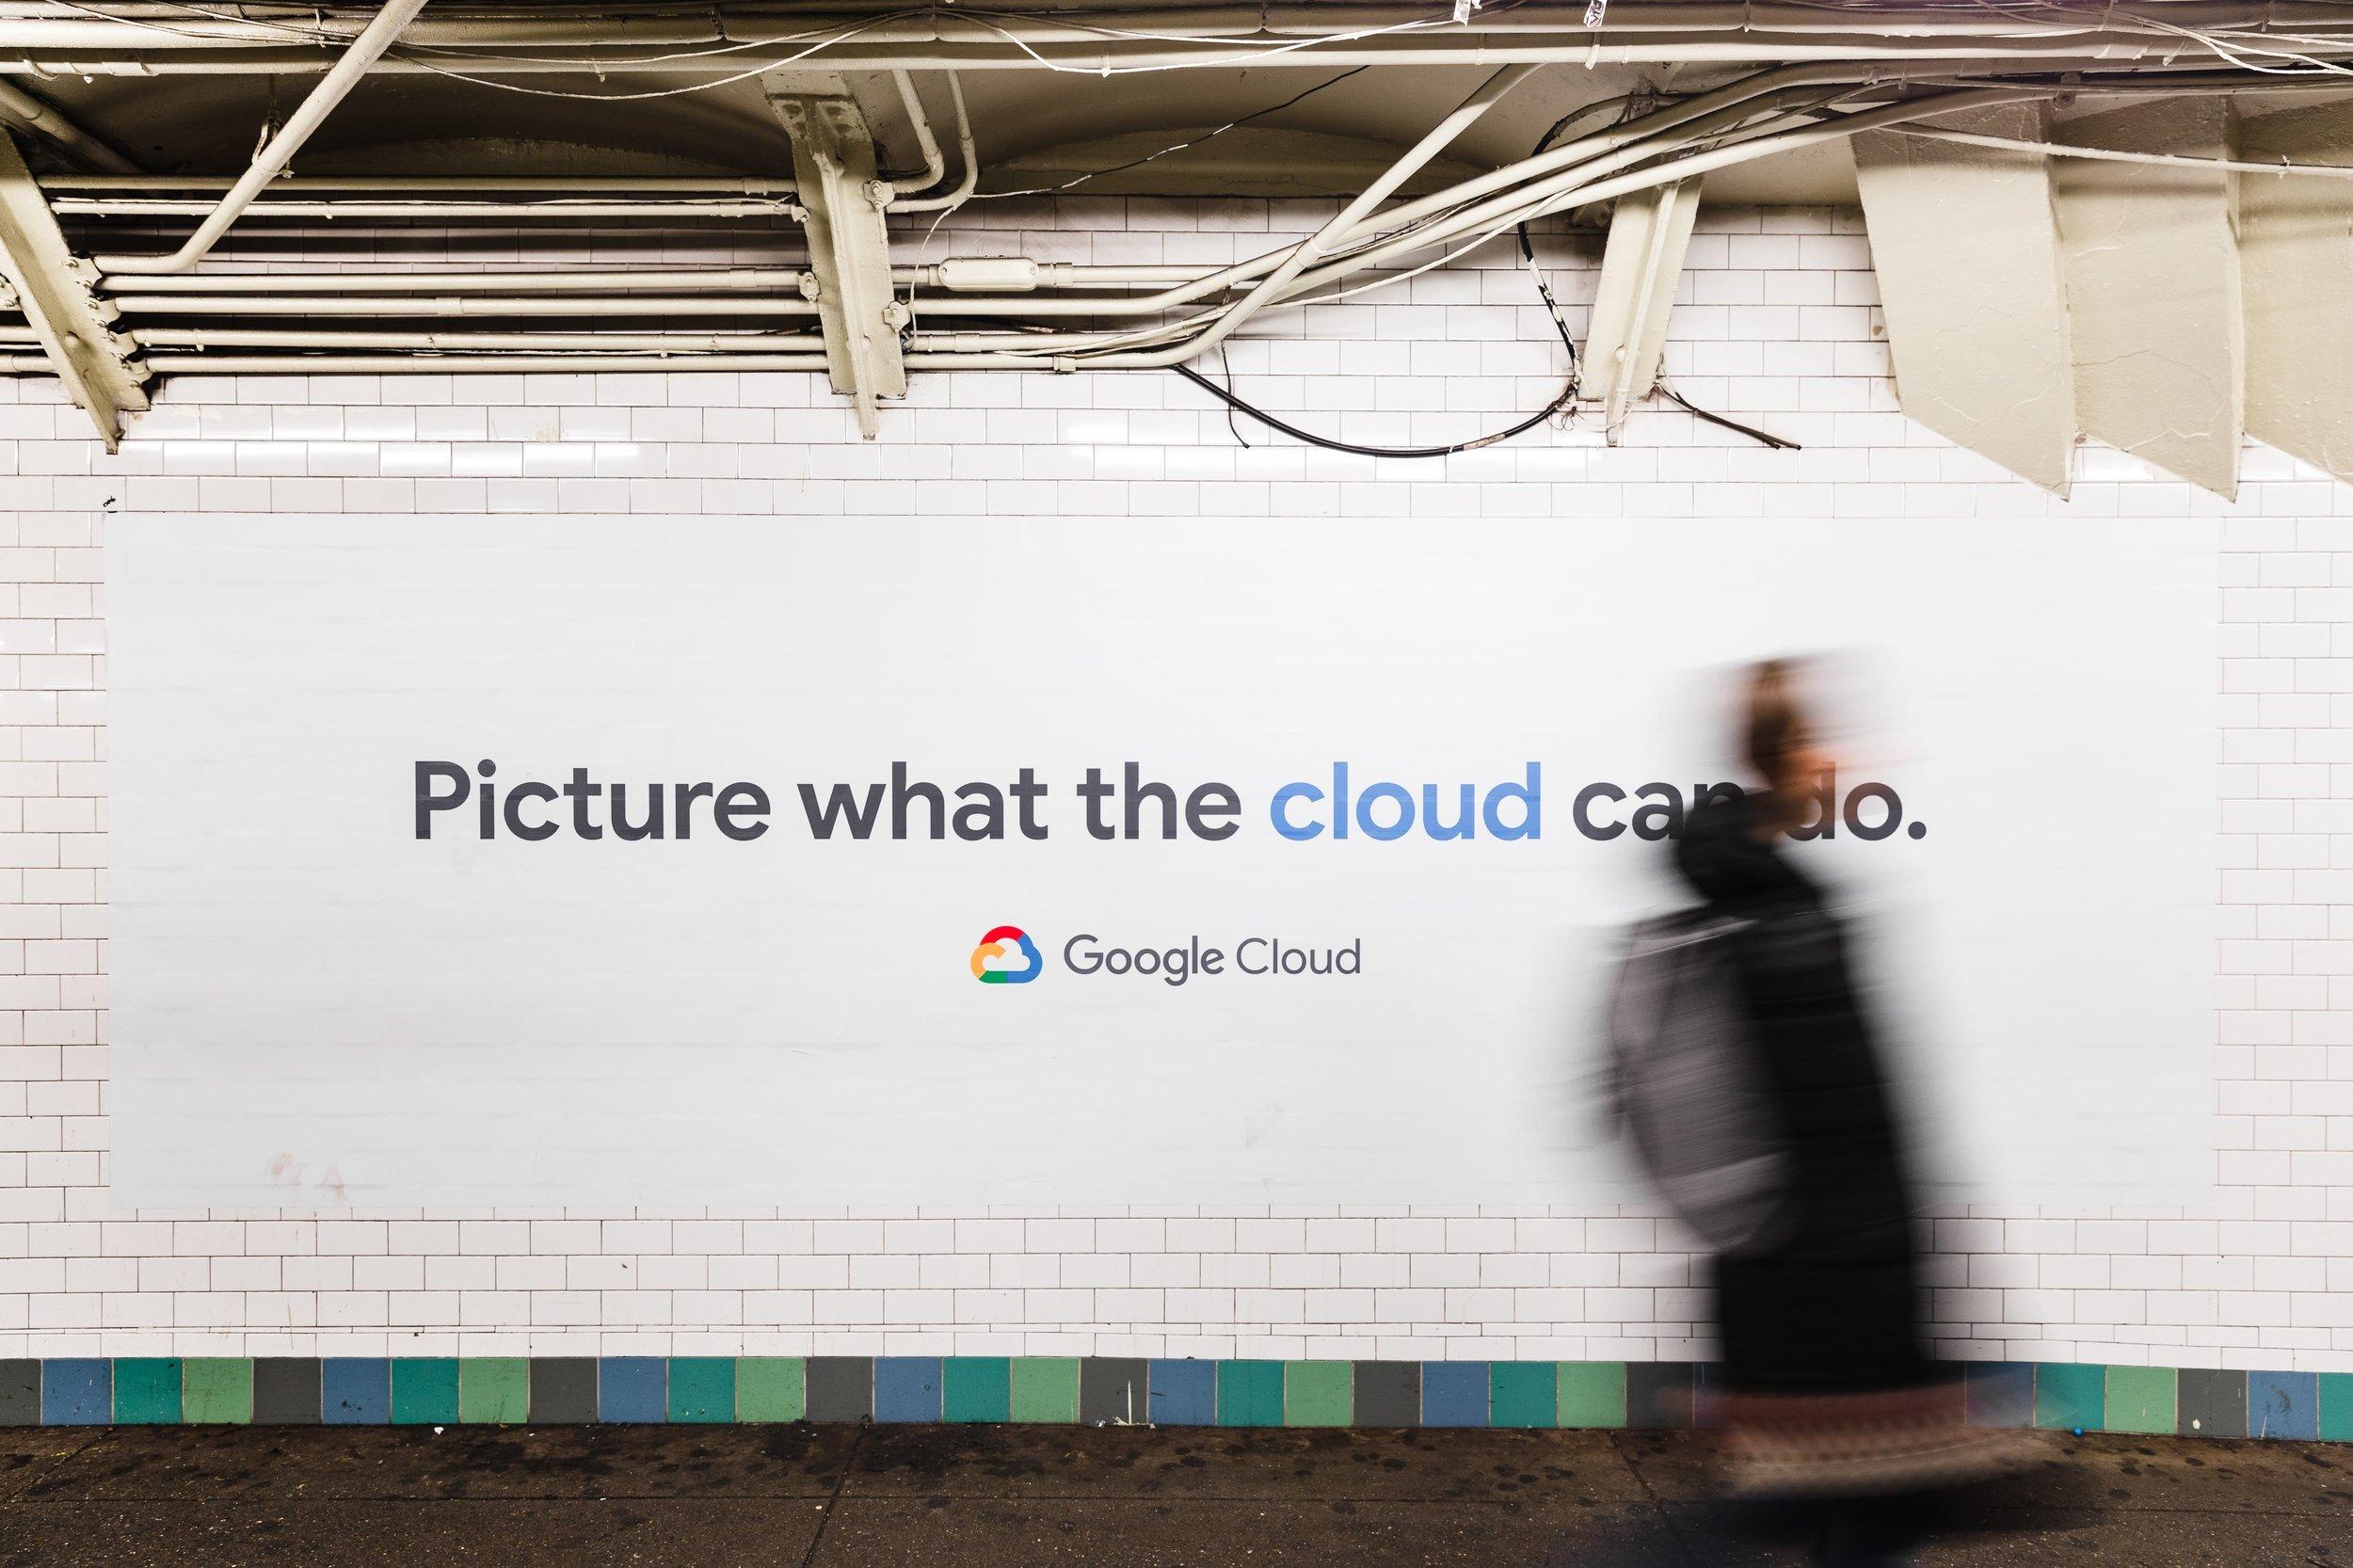 Google_Times Square-0474.jpg